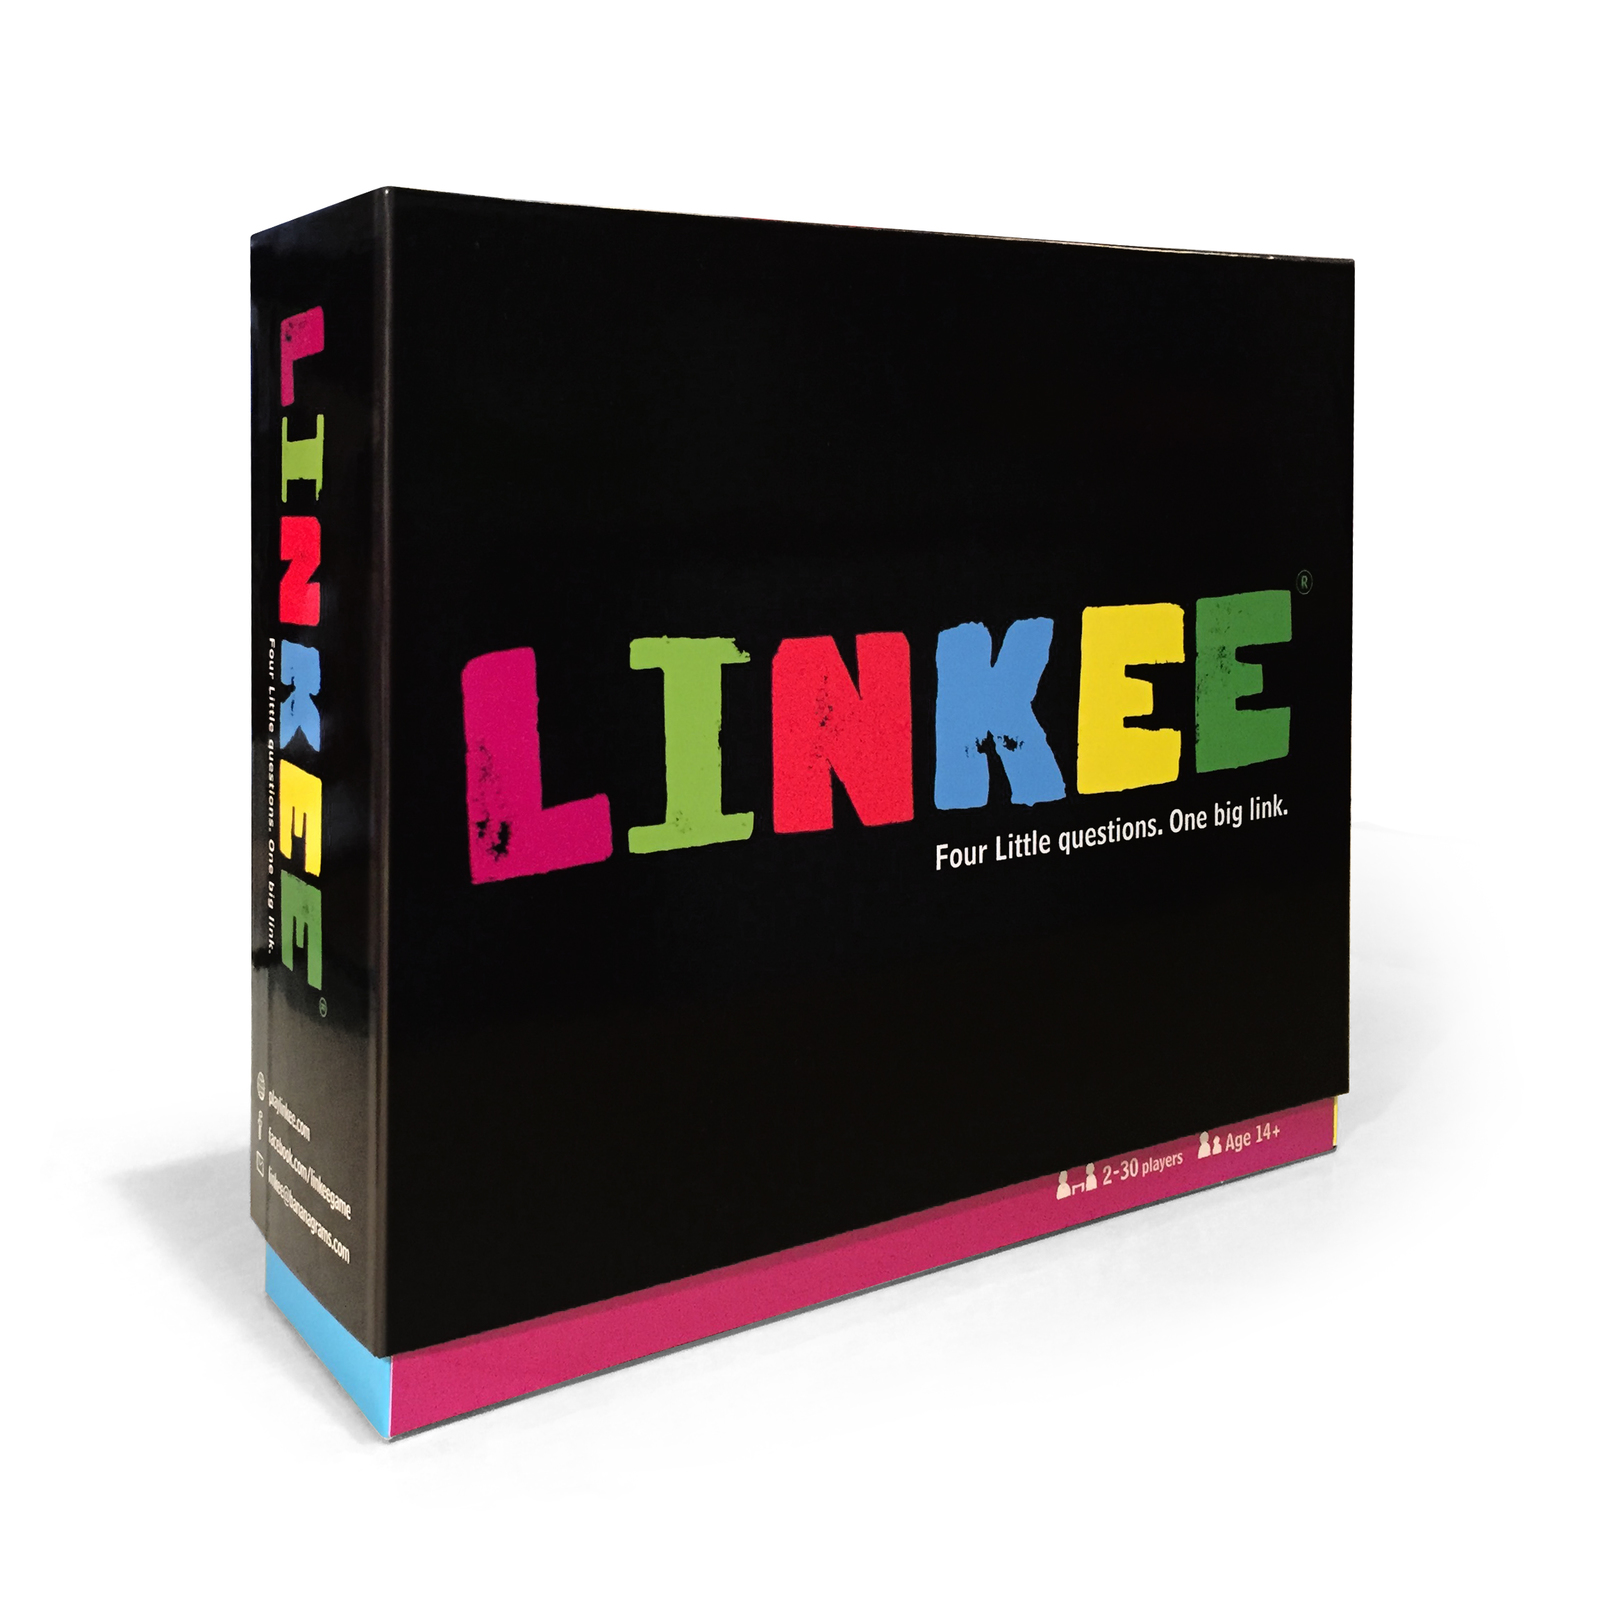 Linkee image